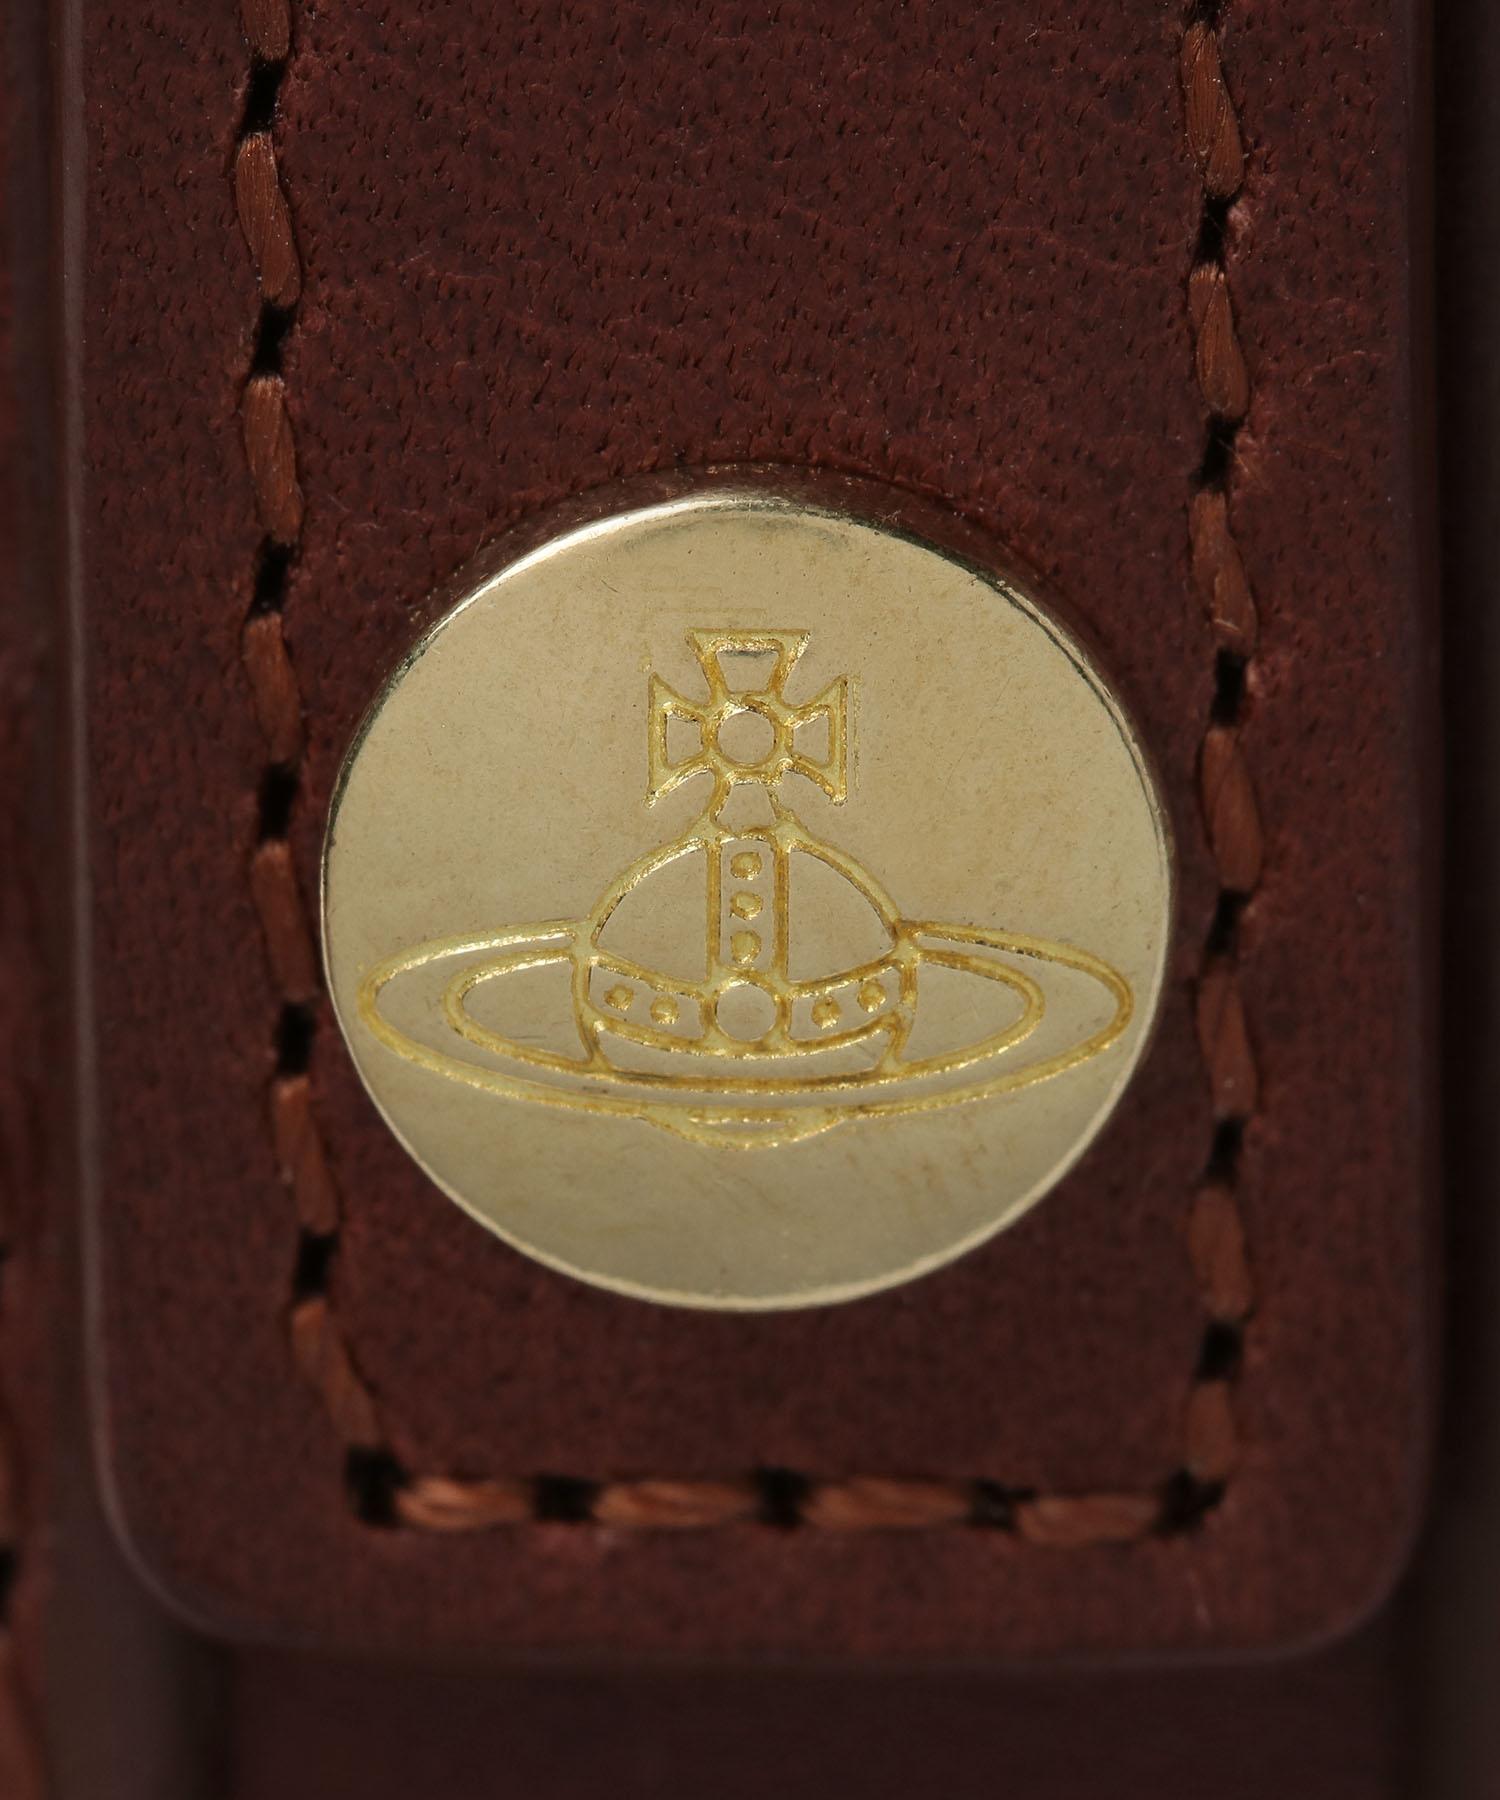 BRASS COIN ペンケース